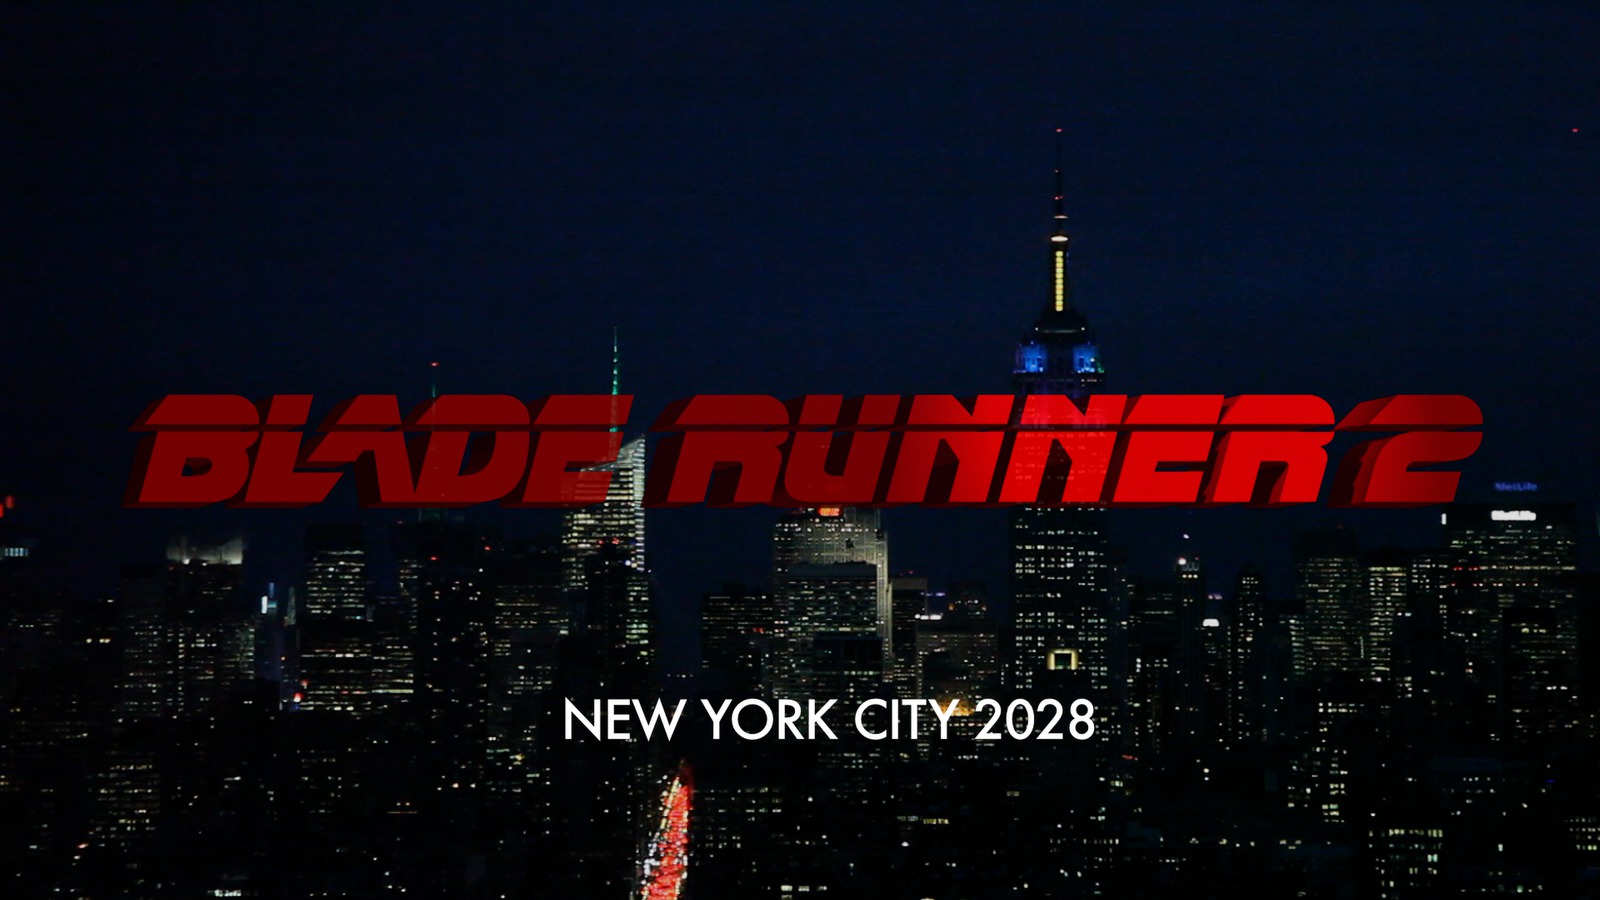 Blade Runner 2 - photo#5